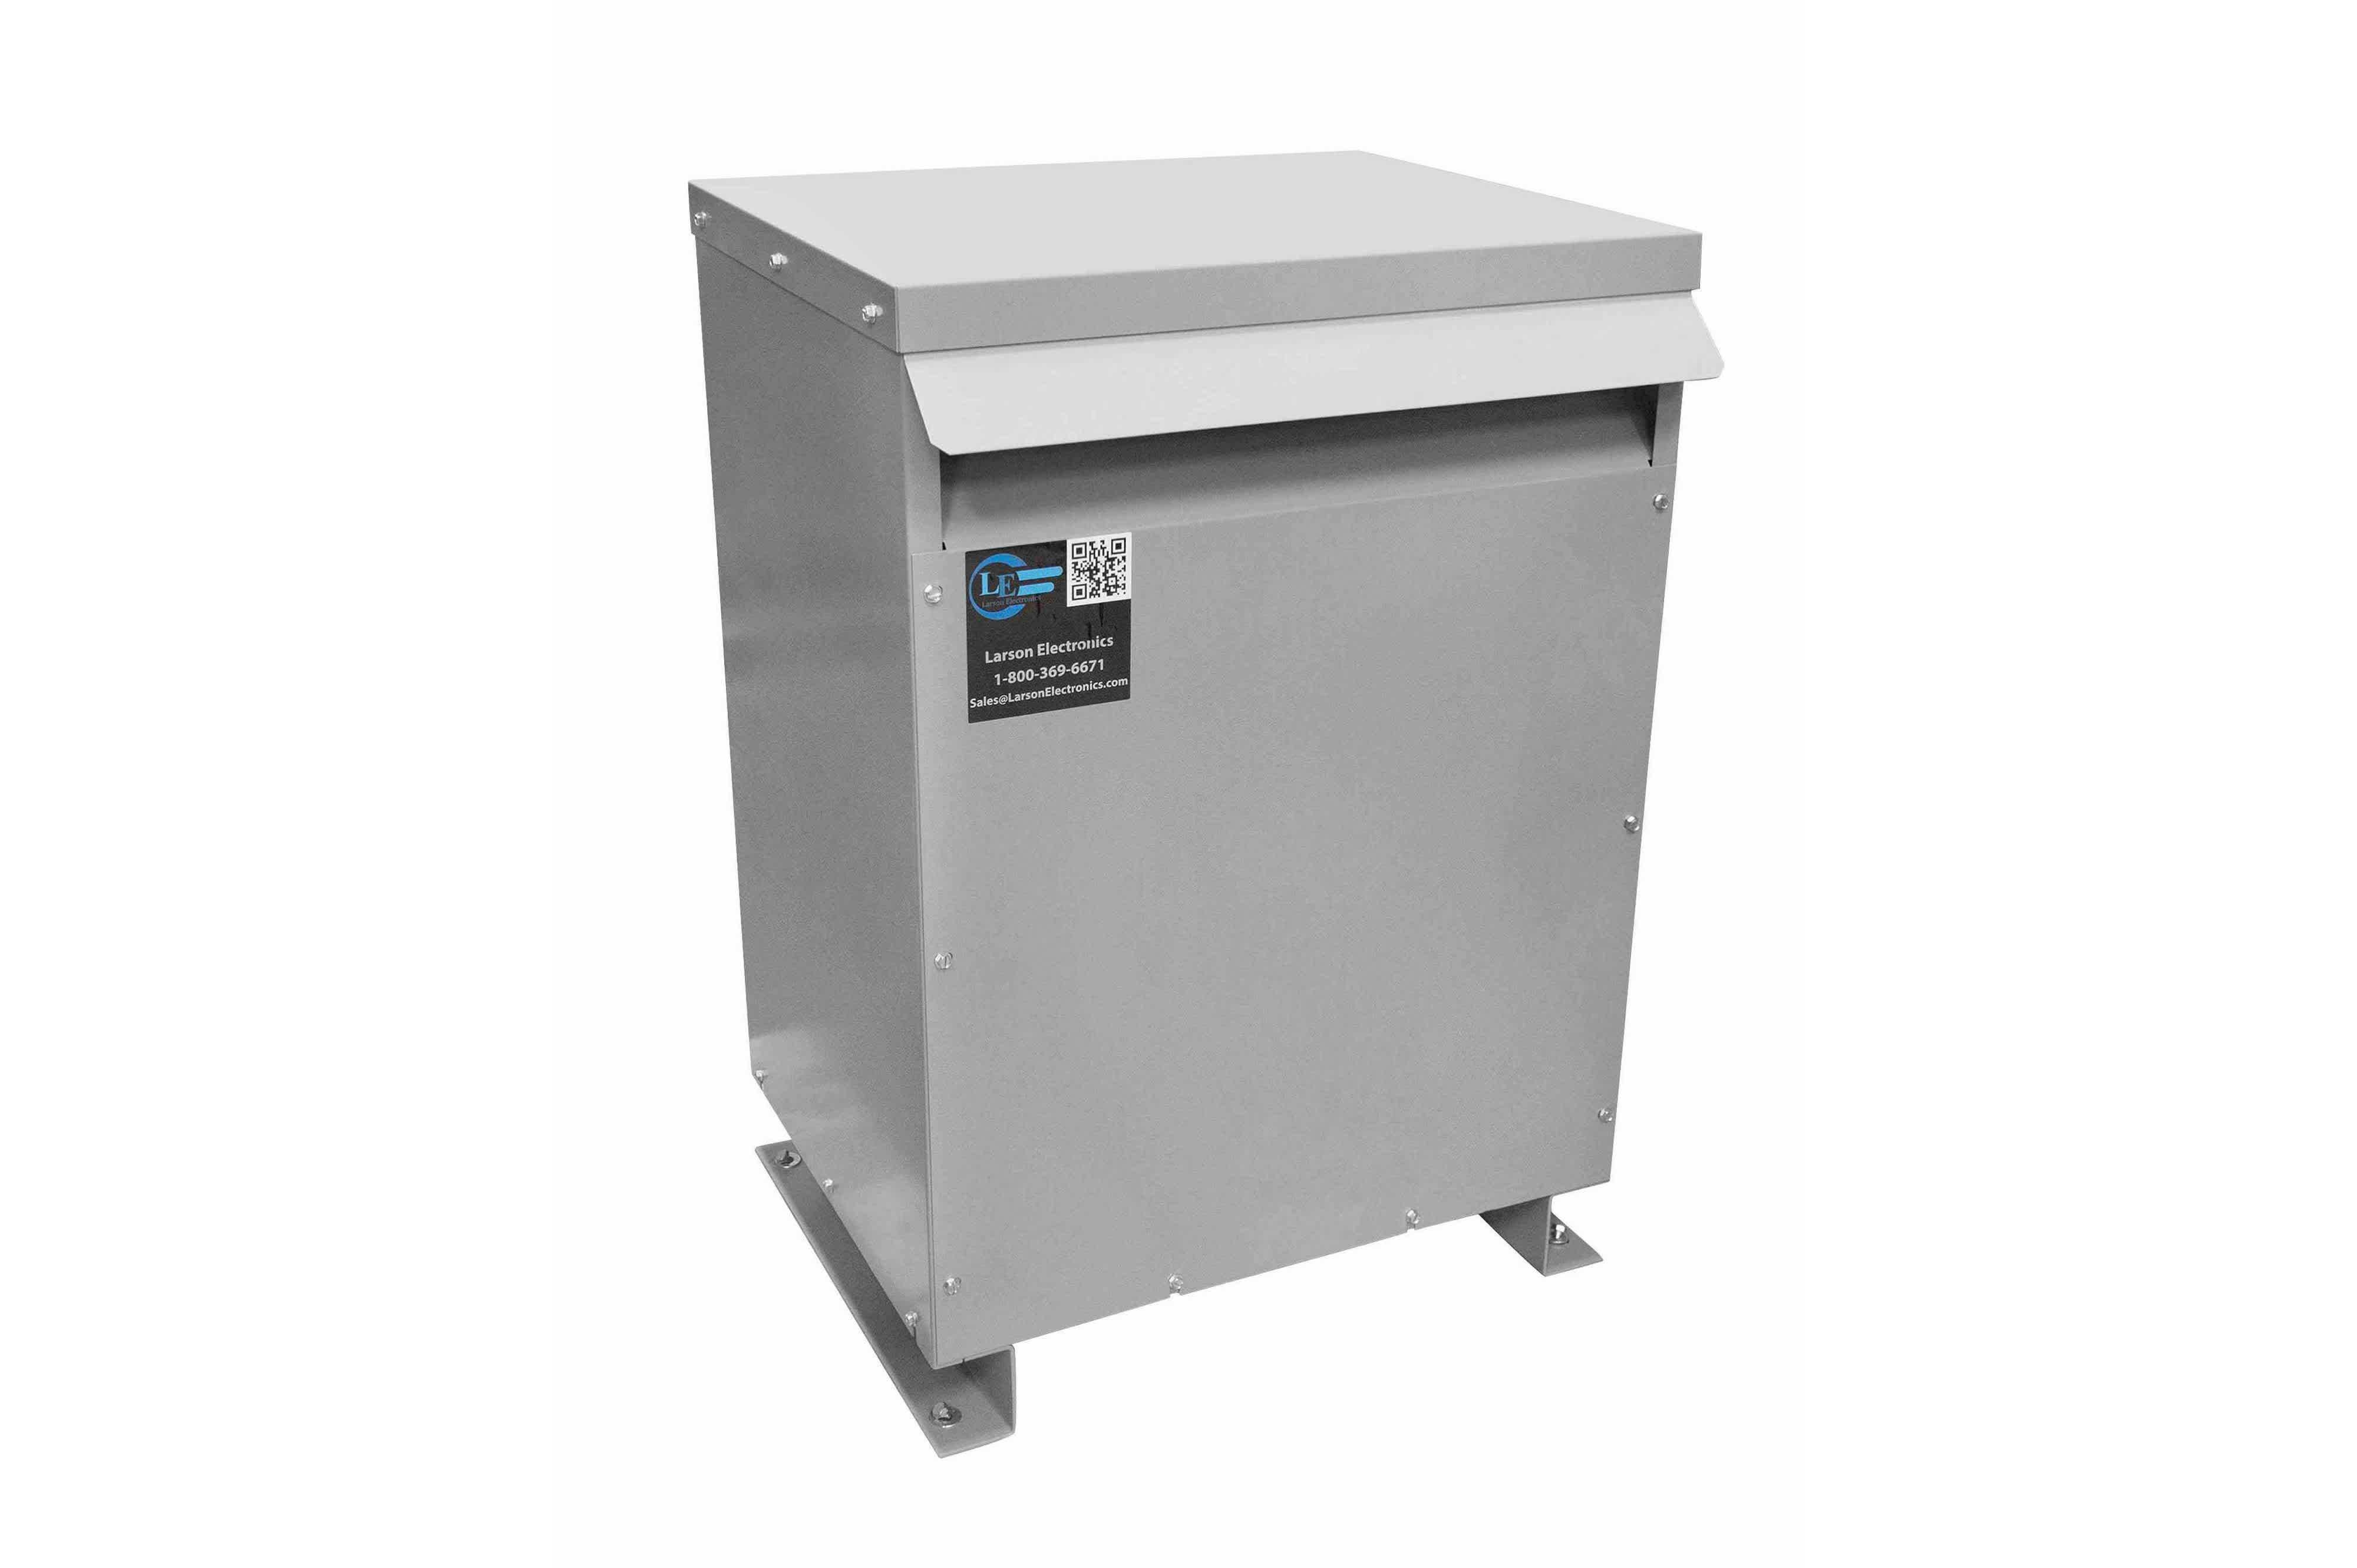 37.5 kVA 3PH Isolation Transformer, 380V Wye Primary, 480Y/277 Wye-N Secondary, N3R, Ventilated, 60 Hz